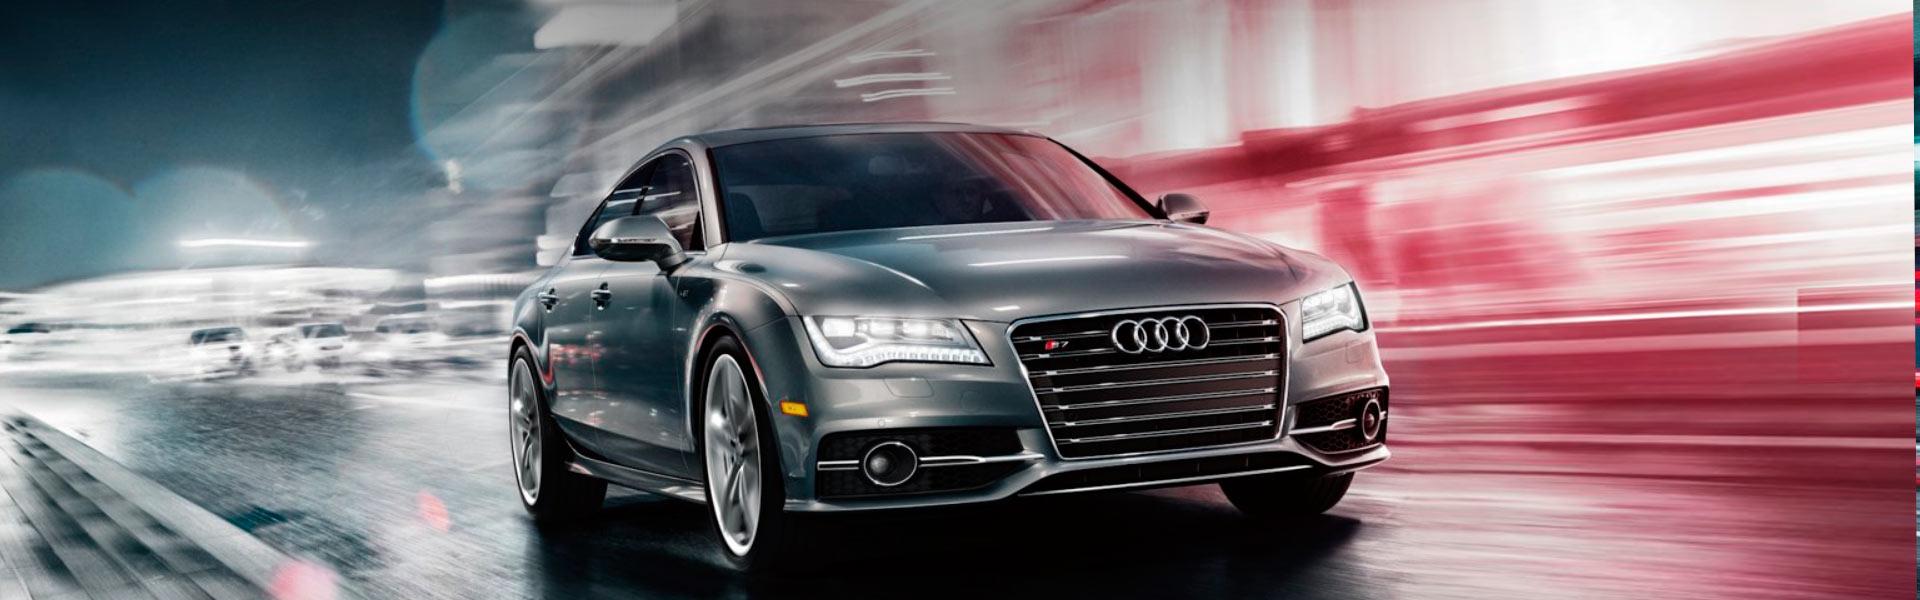 Сервис Audi S7